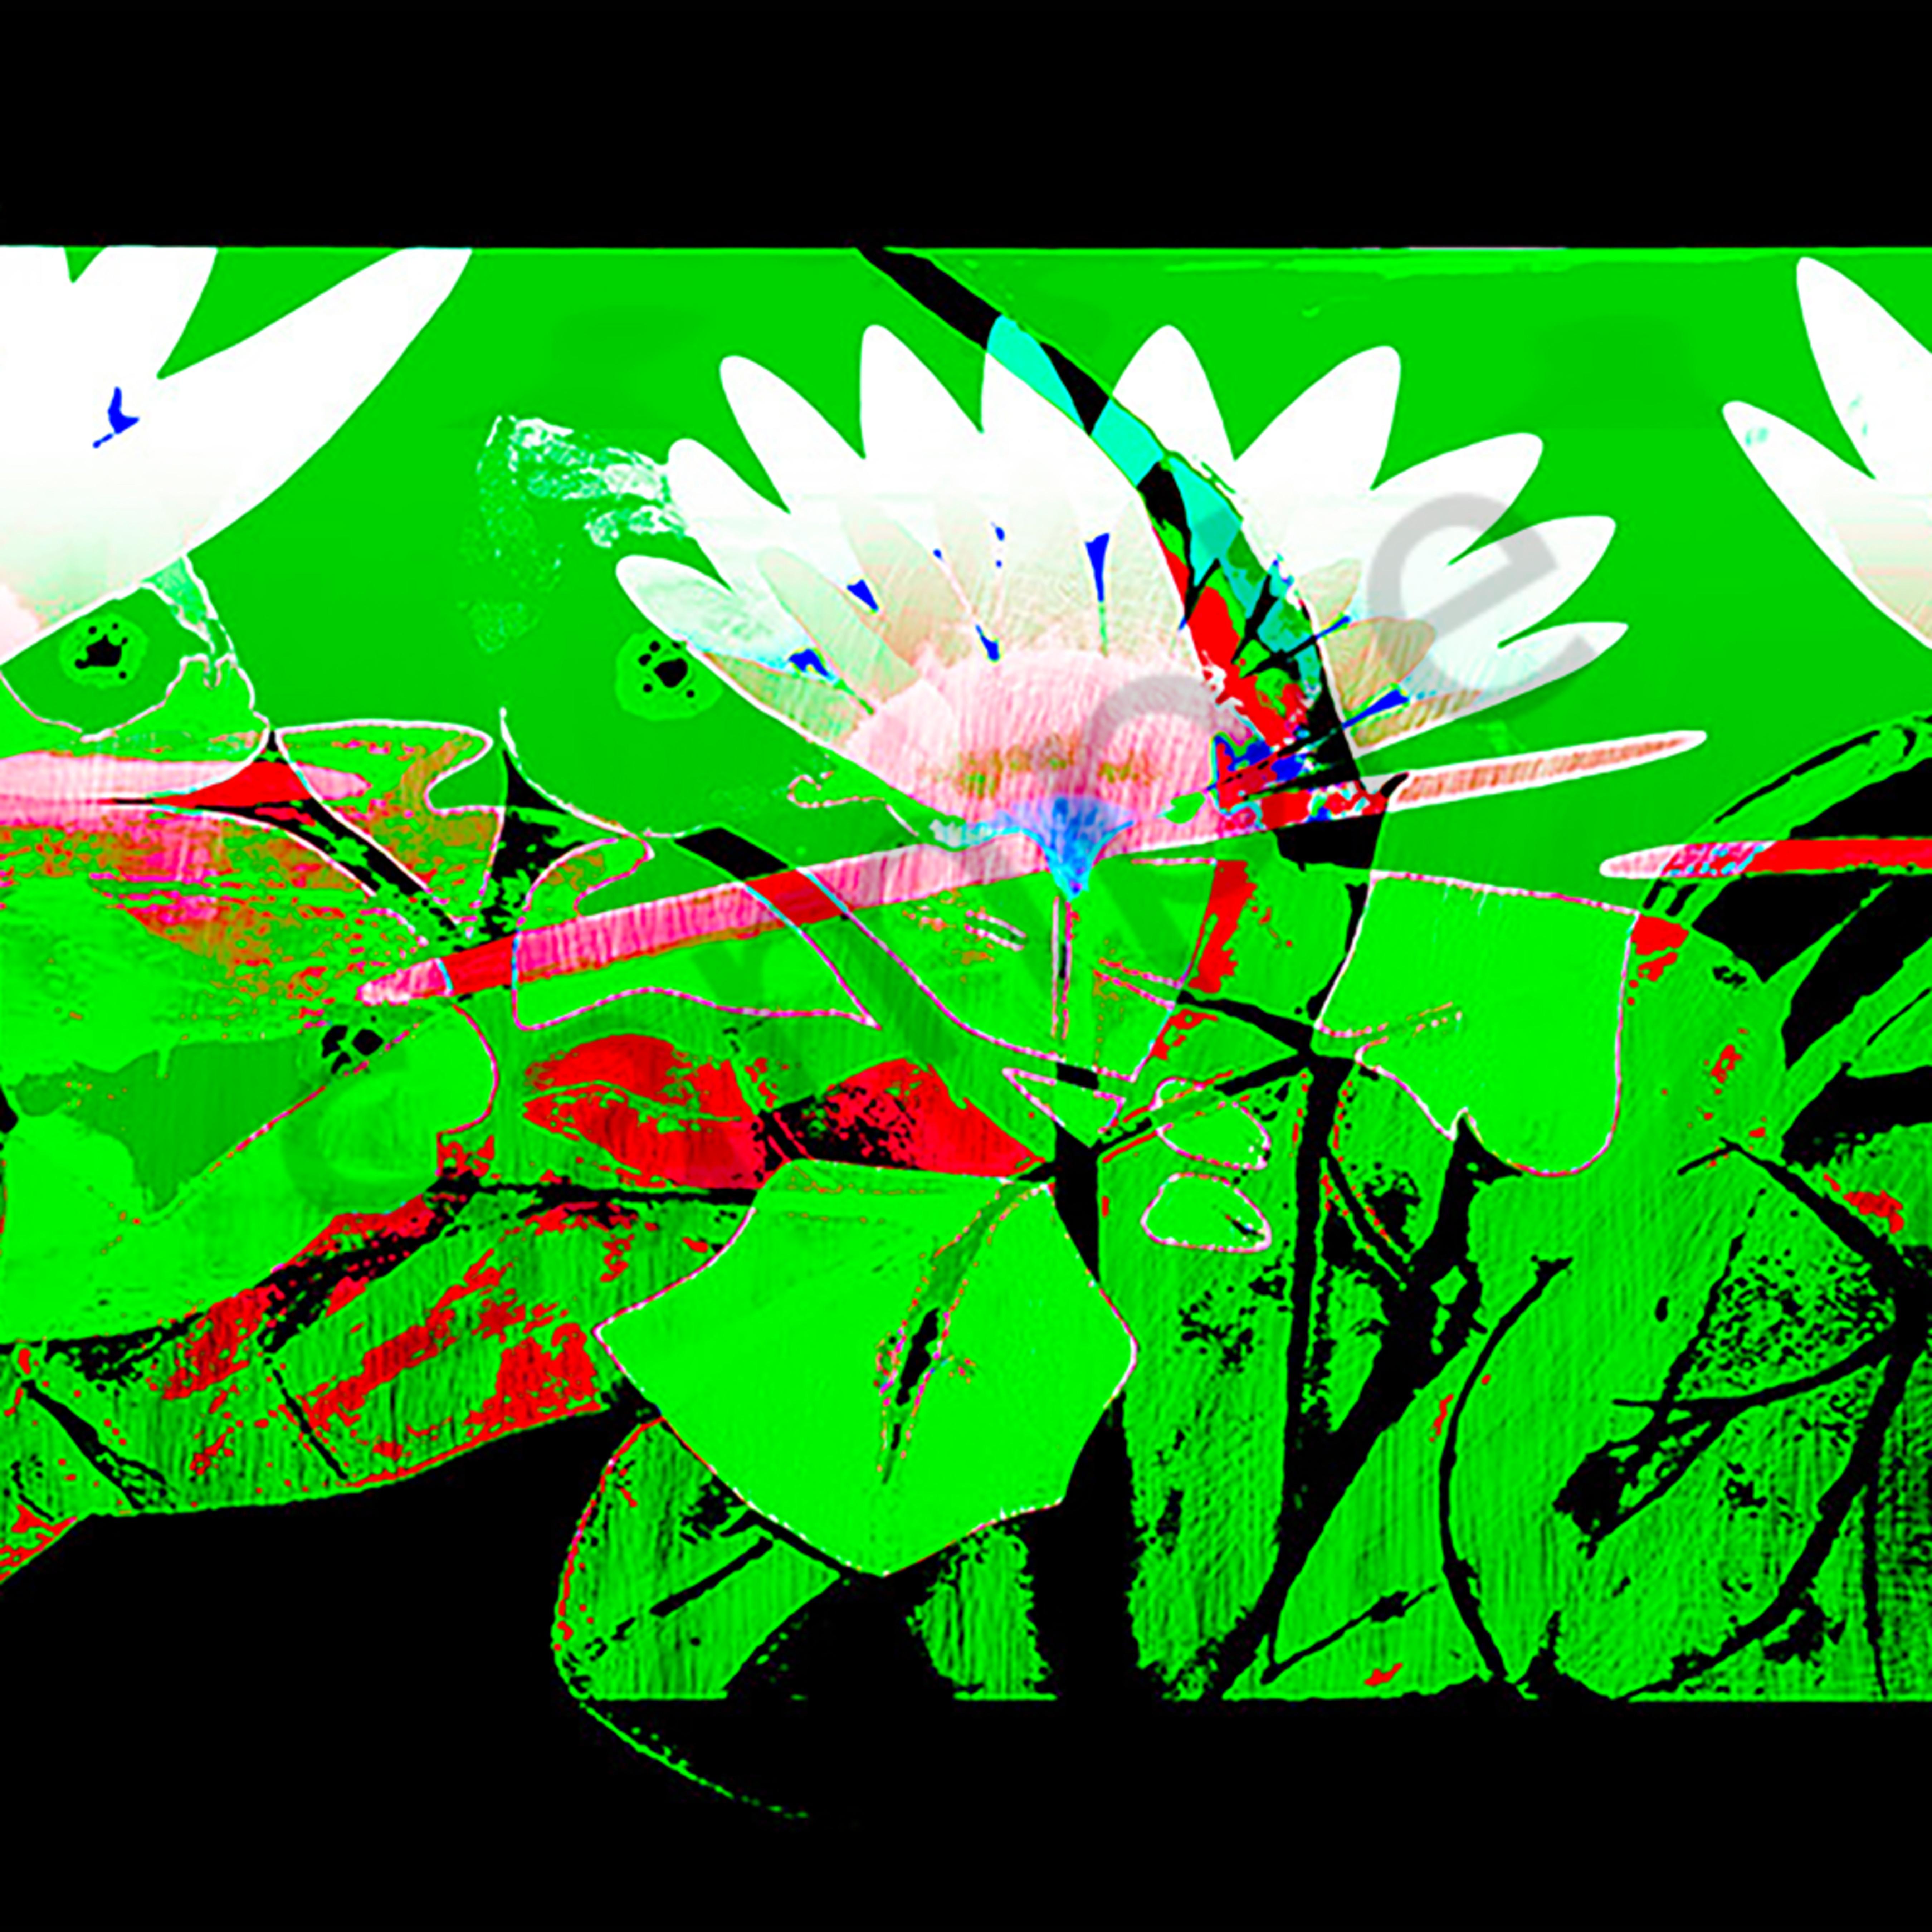 The lillie garden garden 1 eswvqt